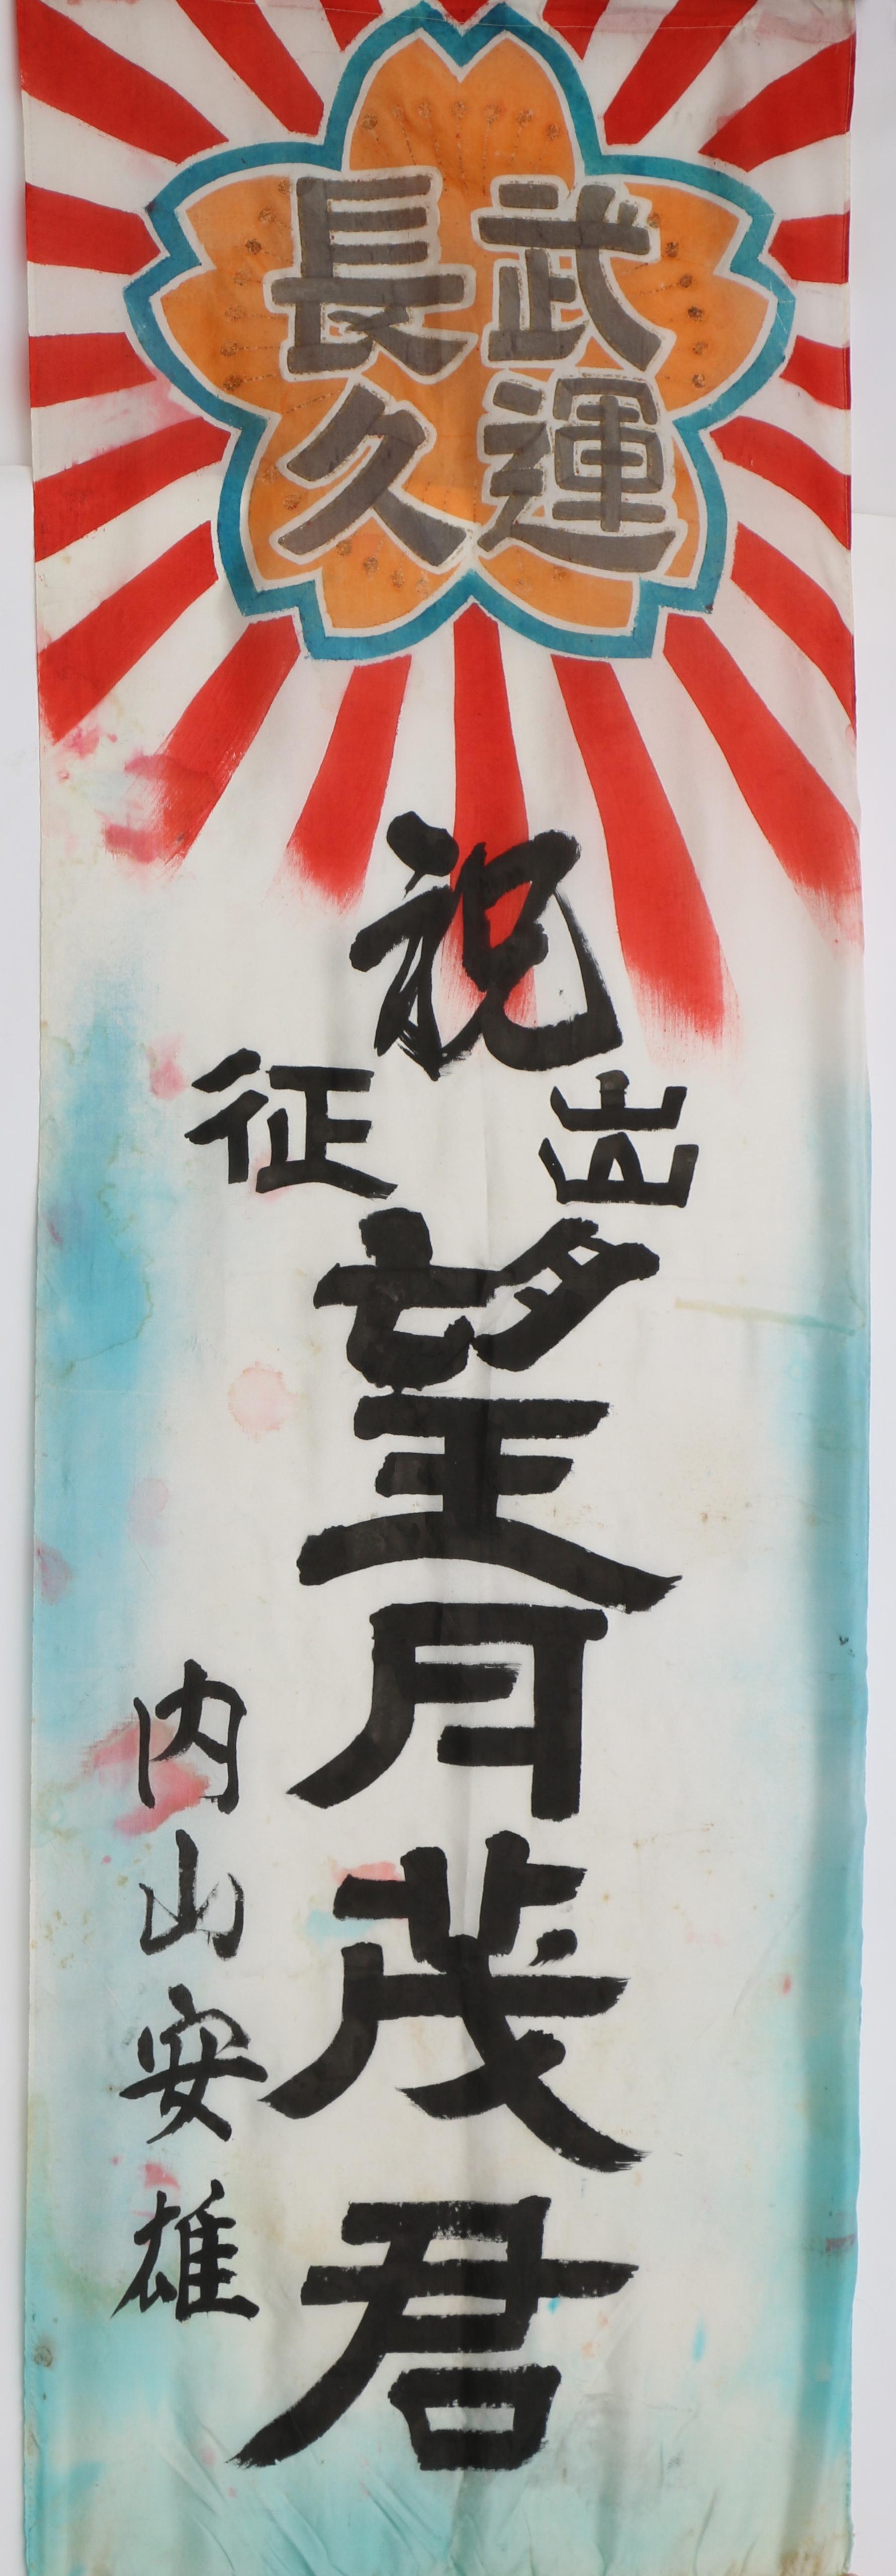 Off-To-War Banner